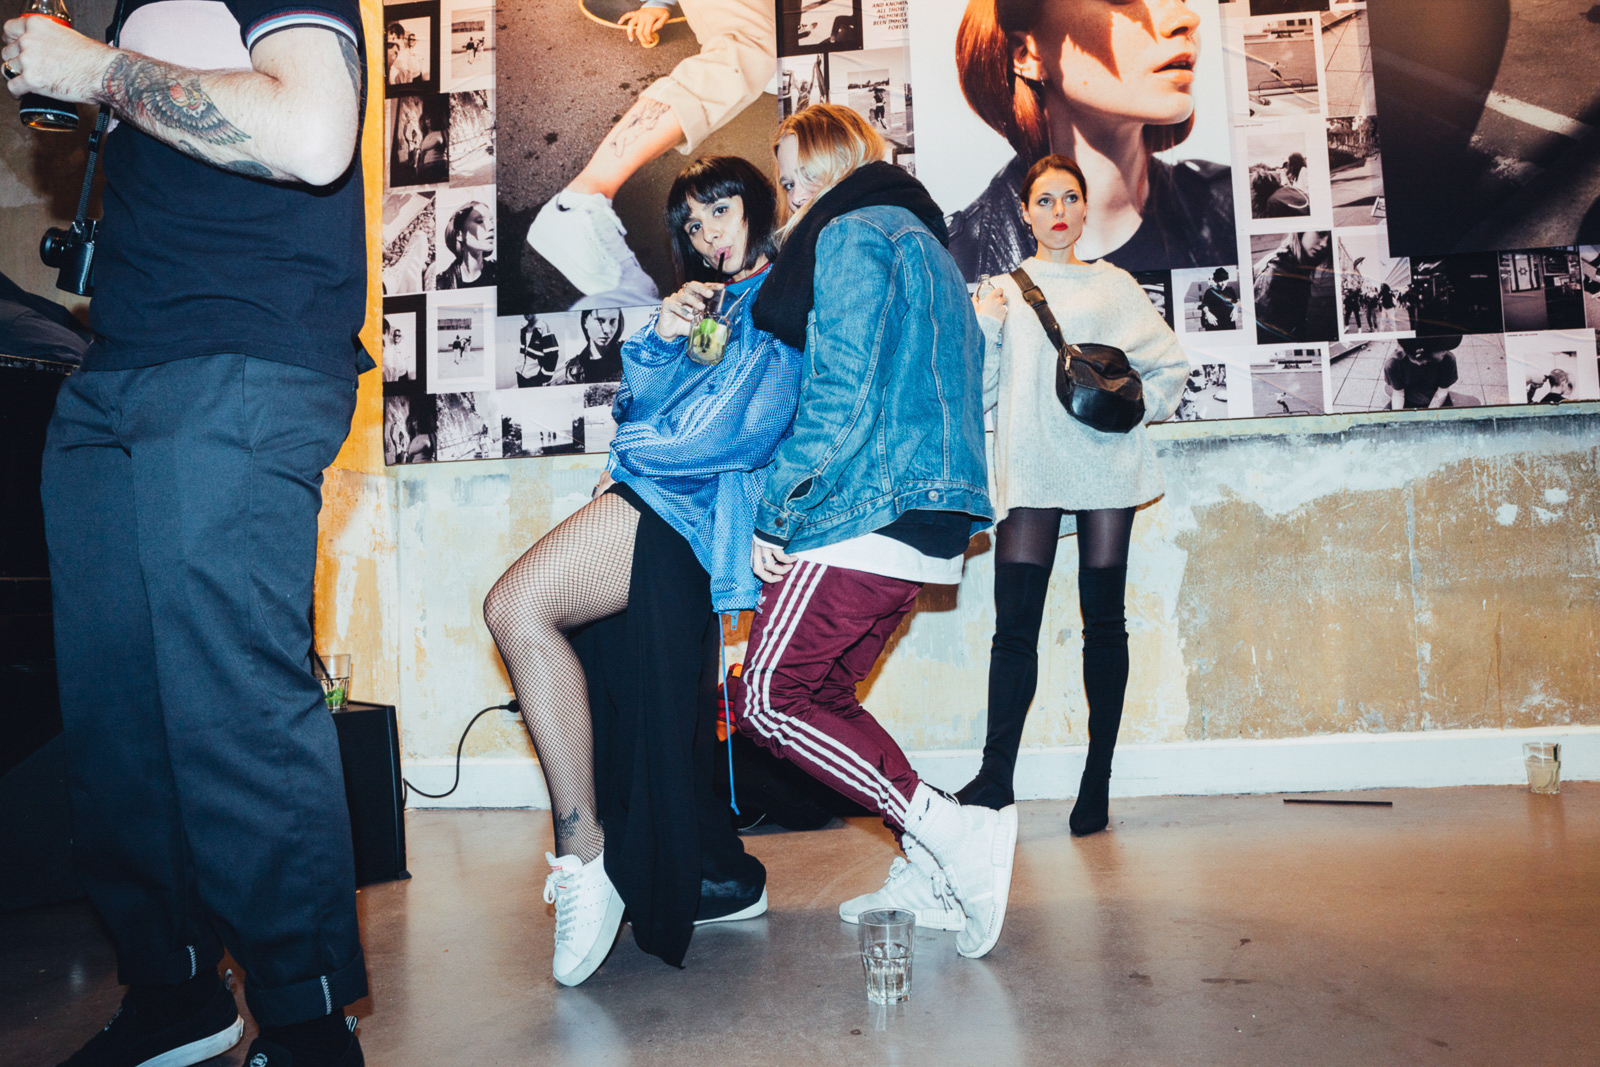 2019_RebeccaRuetten_Web_Girlsareawesome-6.jpg